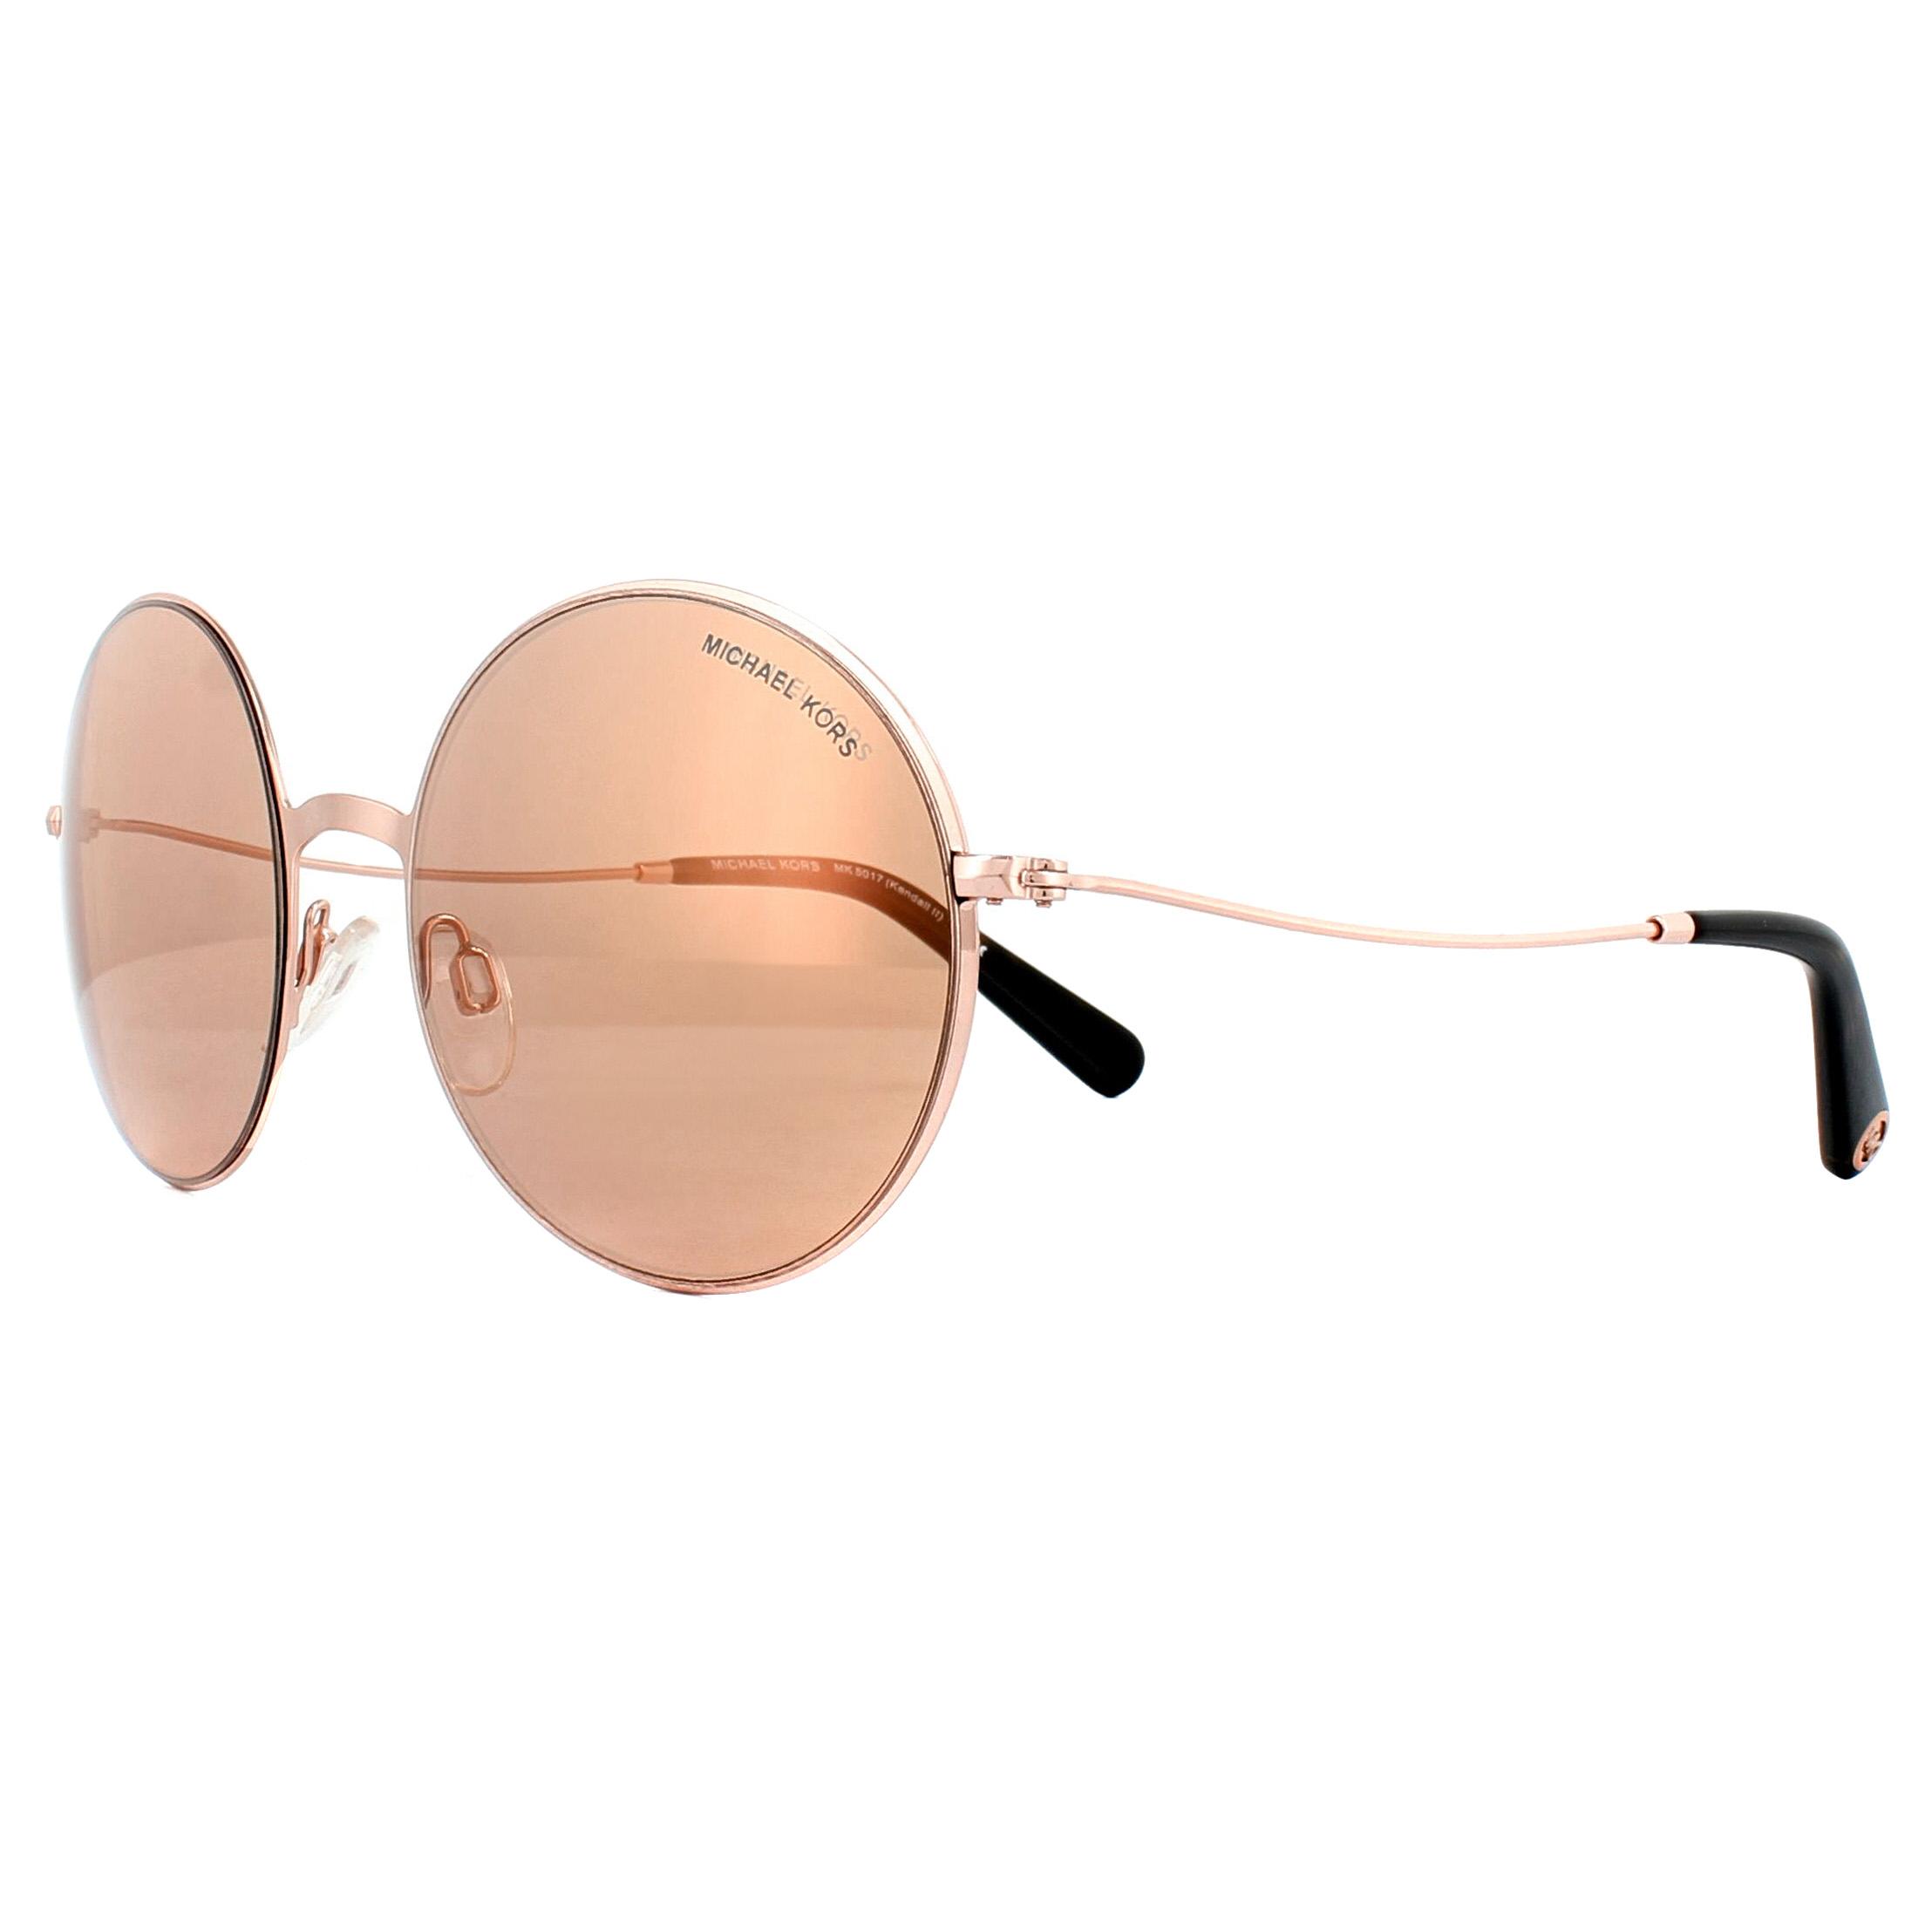 a634c28777a Sentinel Michael Kors Sunglasses Kendall II 5017 1026R1 Rose Gold Rose Gold  Flash